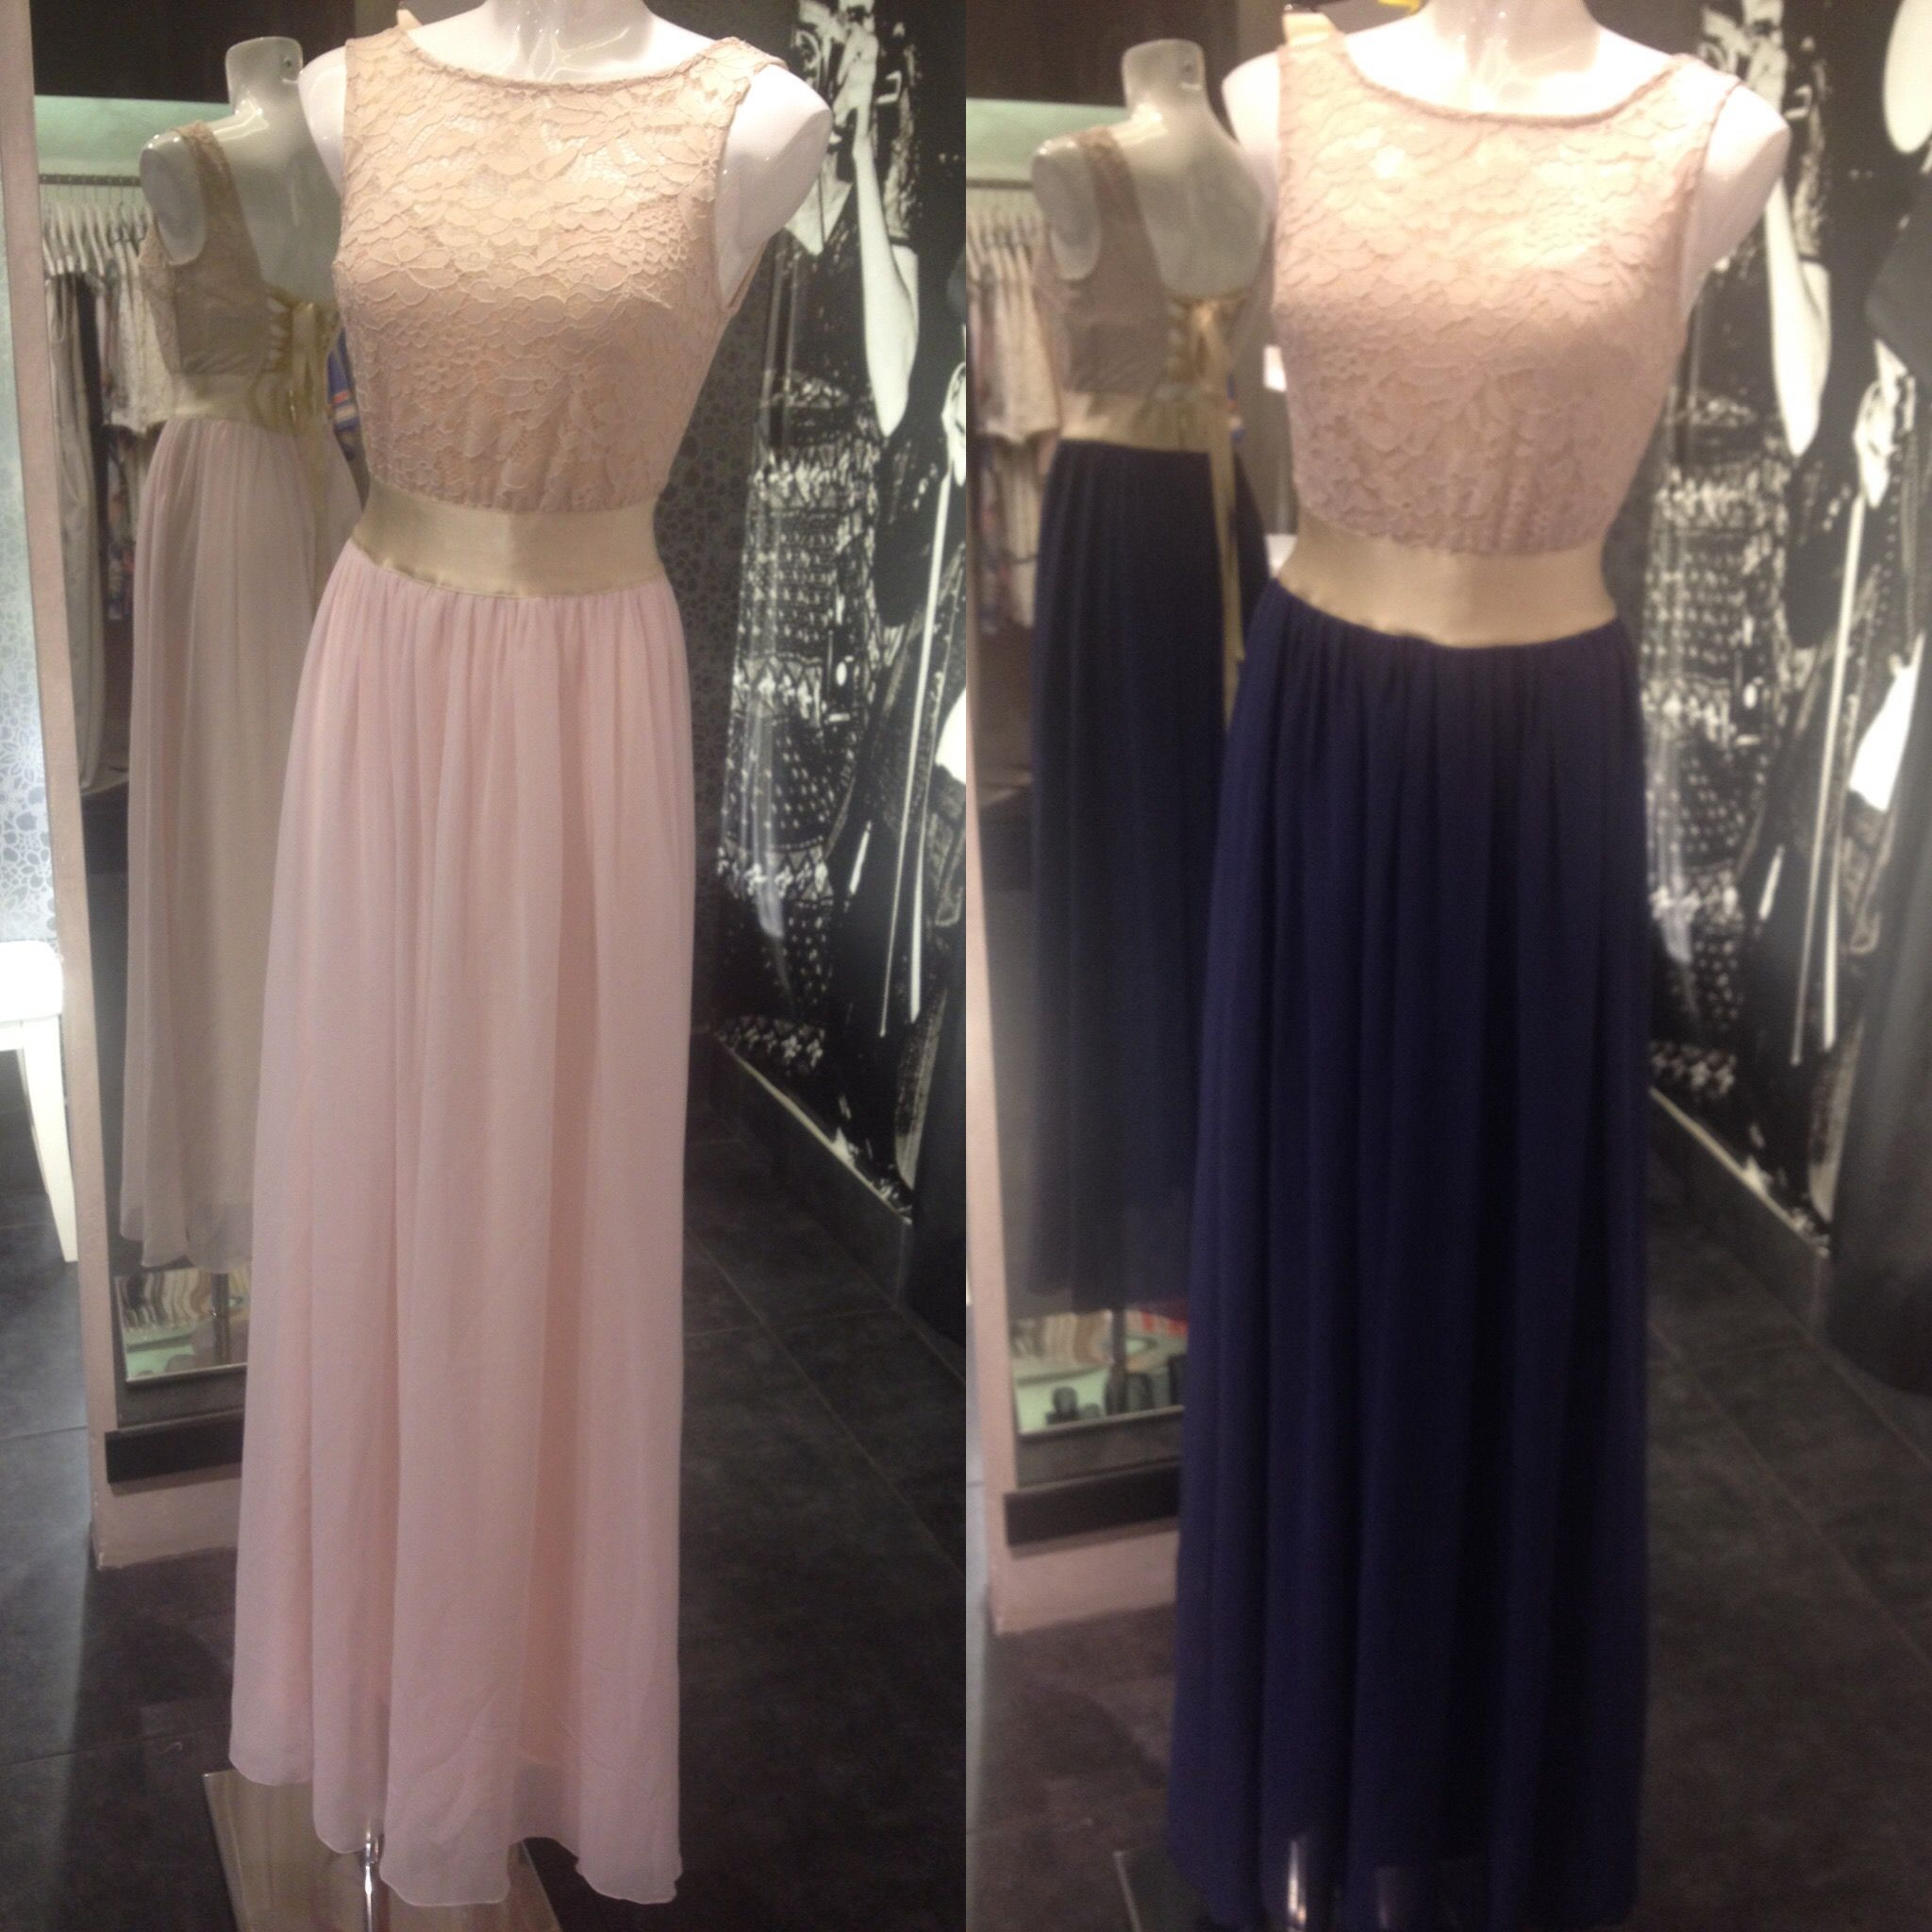 Maxi φόρεμα από μουσελίνα και δαντέλα και με χρυσή ζώνη.Διαθέσιμο και πάλι  στο www d54faec99f9